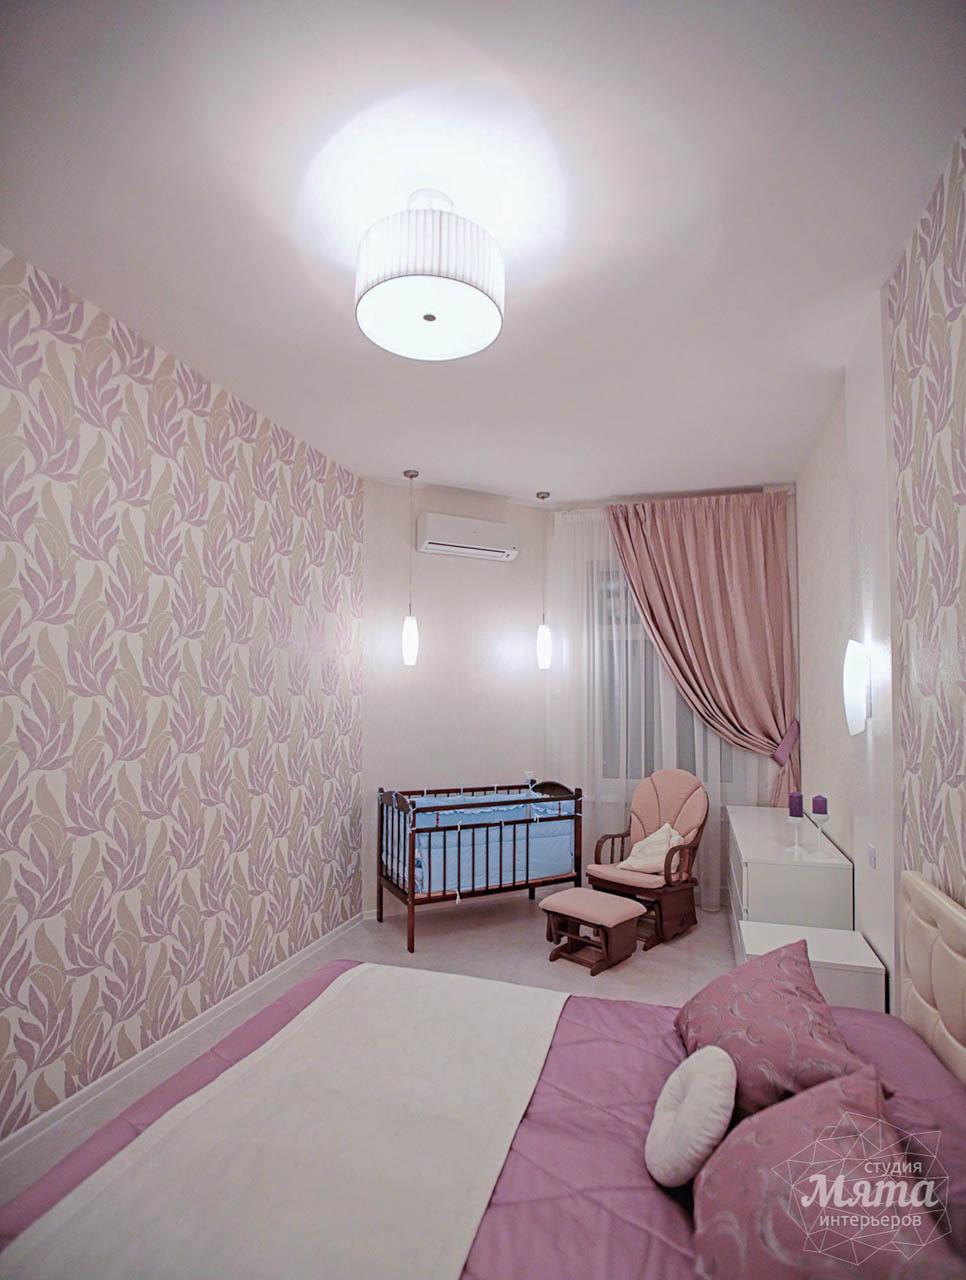 Дизайн интерьера и ремонт трехкомнатной квартиры по ул. Чкалова 124 23